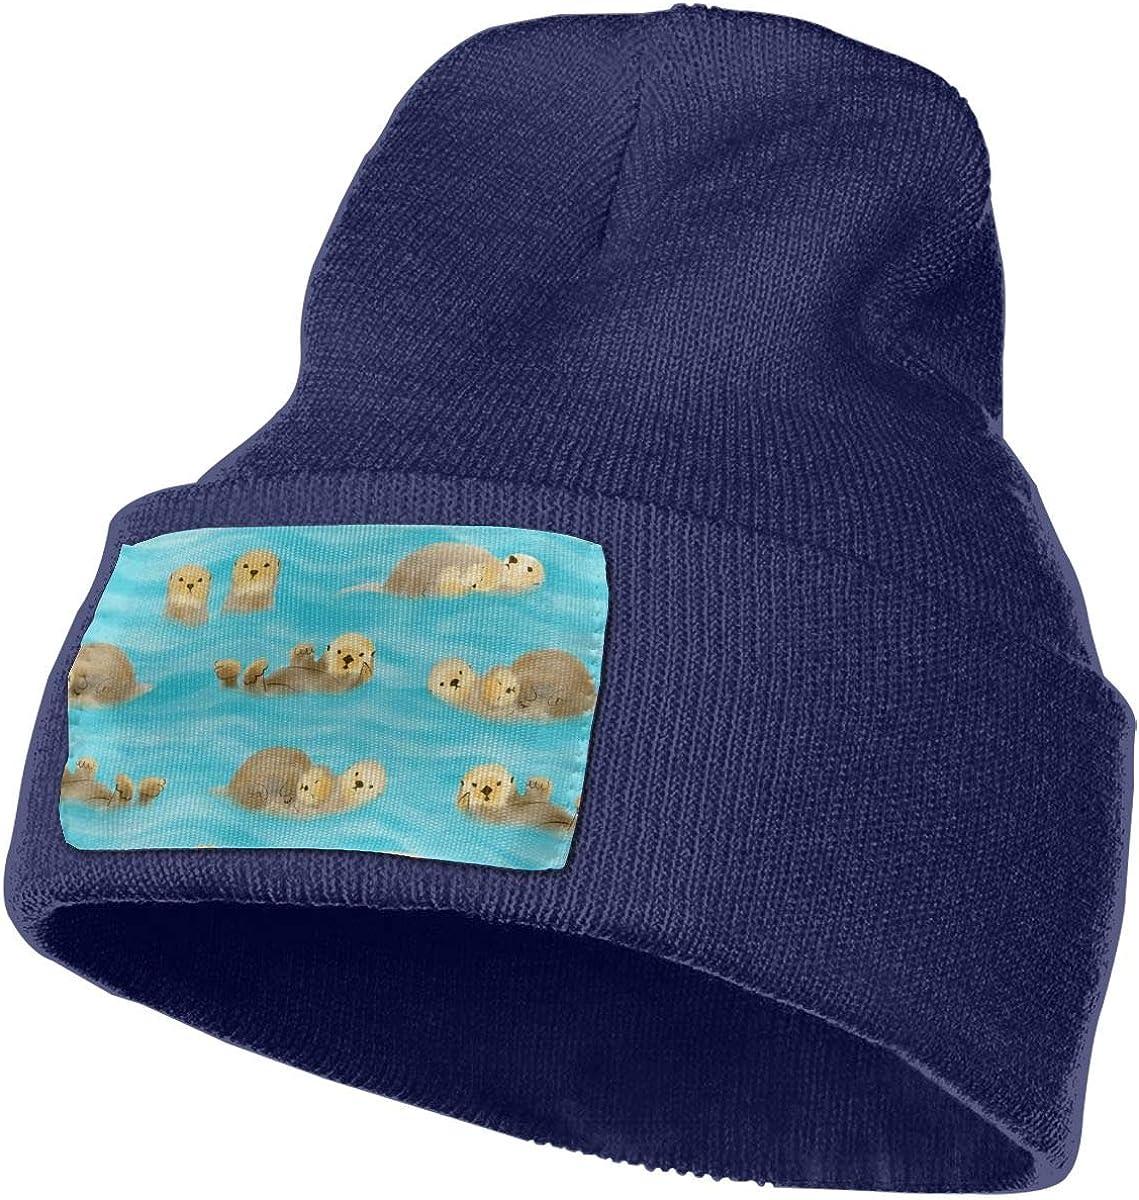 Unisex 100/% Acrylic Knitting Hat Cap Otters Sleeping On The Water Cute Skull Beanie